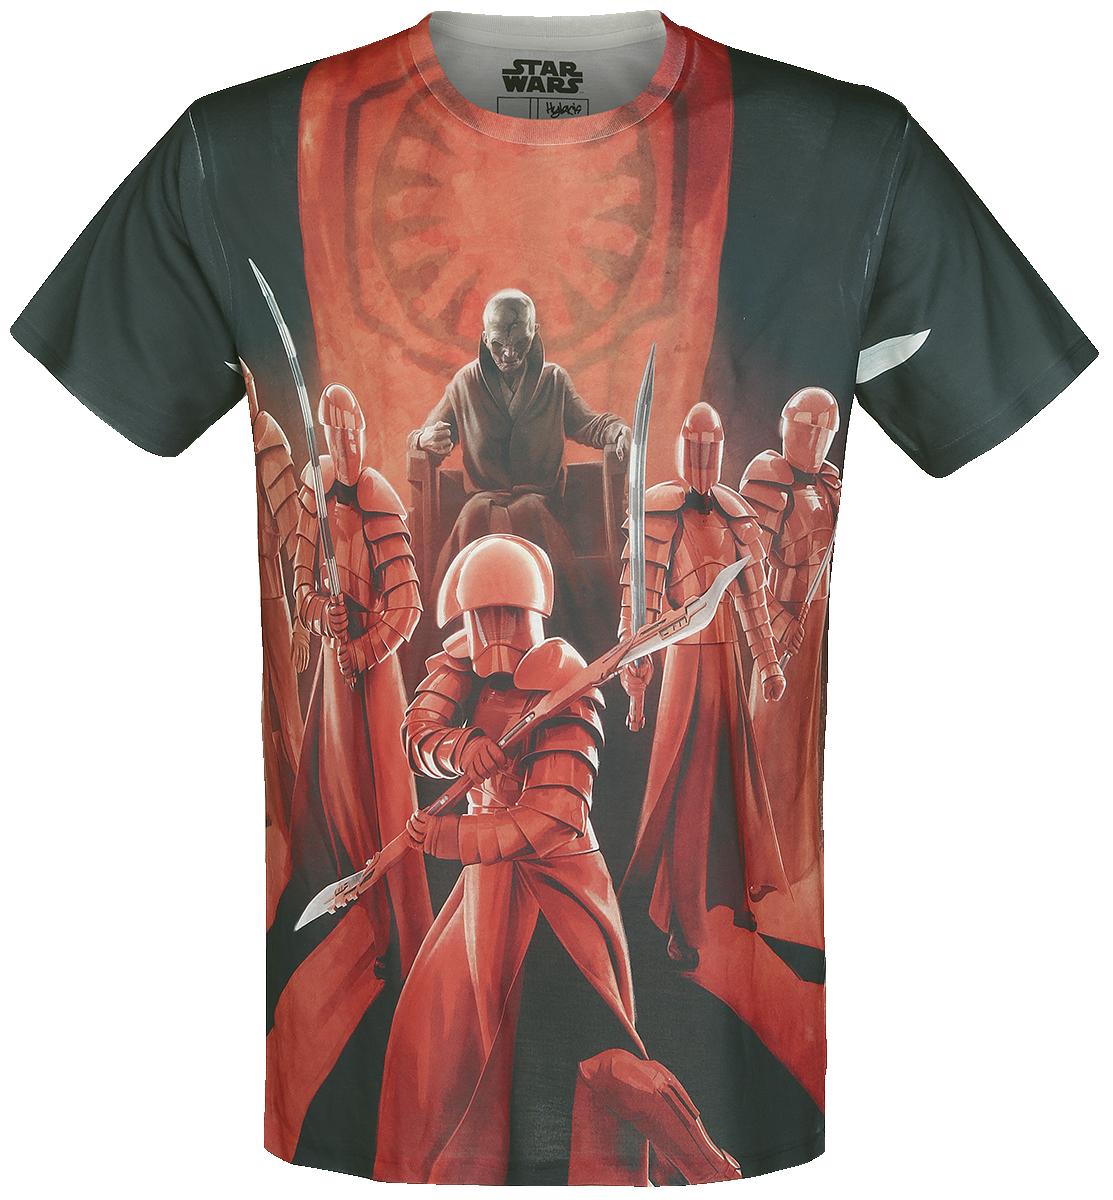 Star Wars Episode 8 - Die letzten Jedi - Snoke Praetorian Guards T-Shirt multifarvet